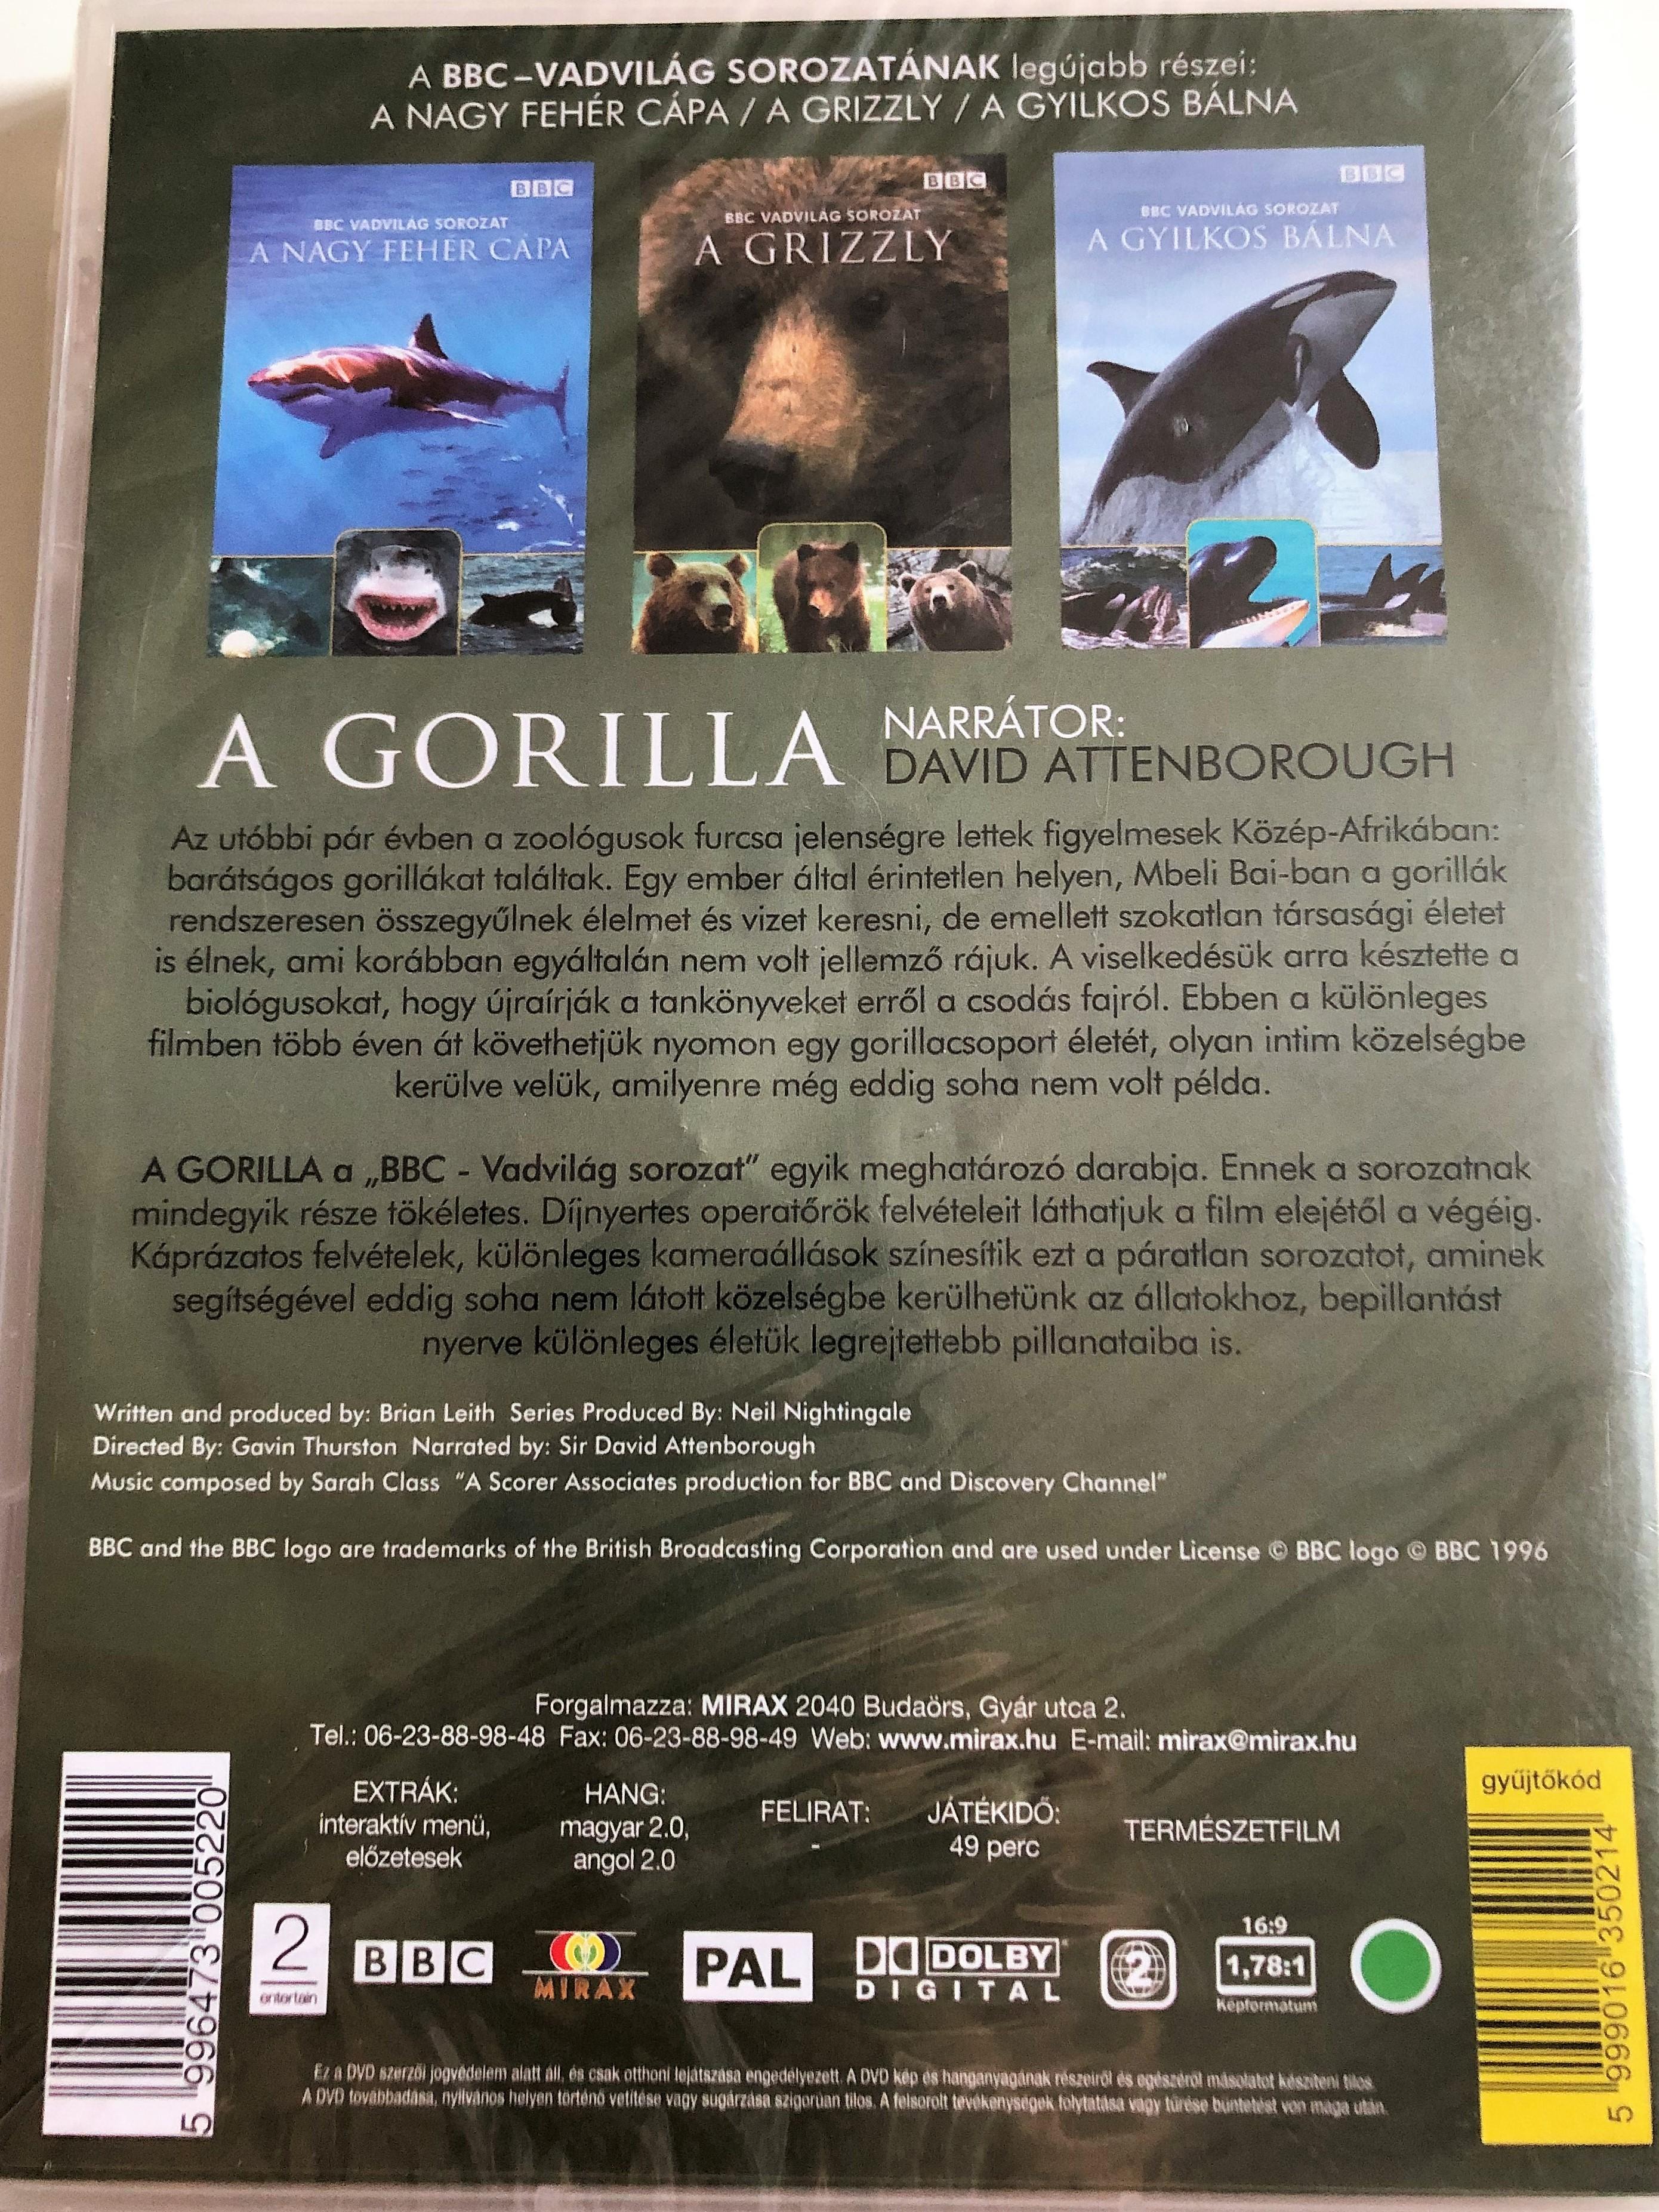 a-gorilla-gorillas-on-the-trail-of-king-kong-bbc-wildlife-series-narrated-by-sir-david-attenborough-dvd-2002-bbc-vadvil-g-sorozat-2-.jpg